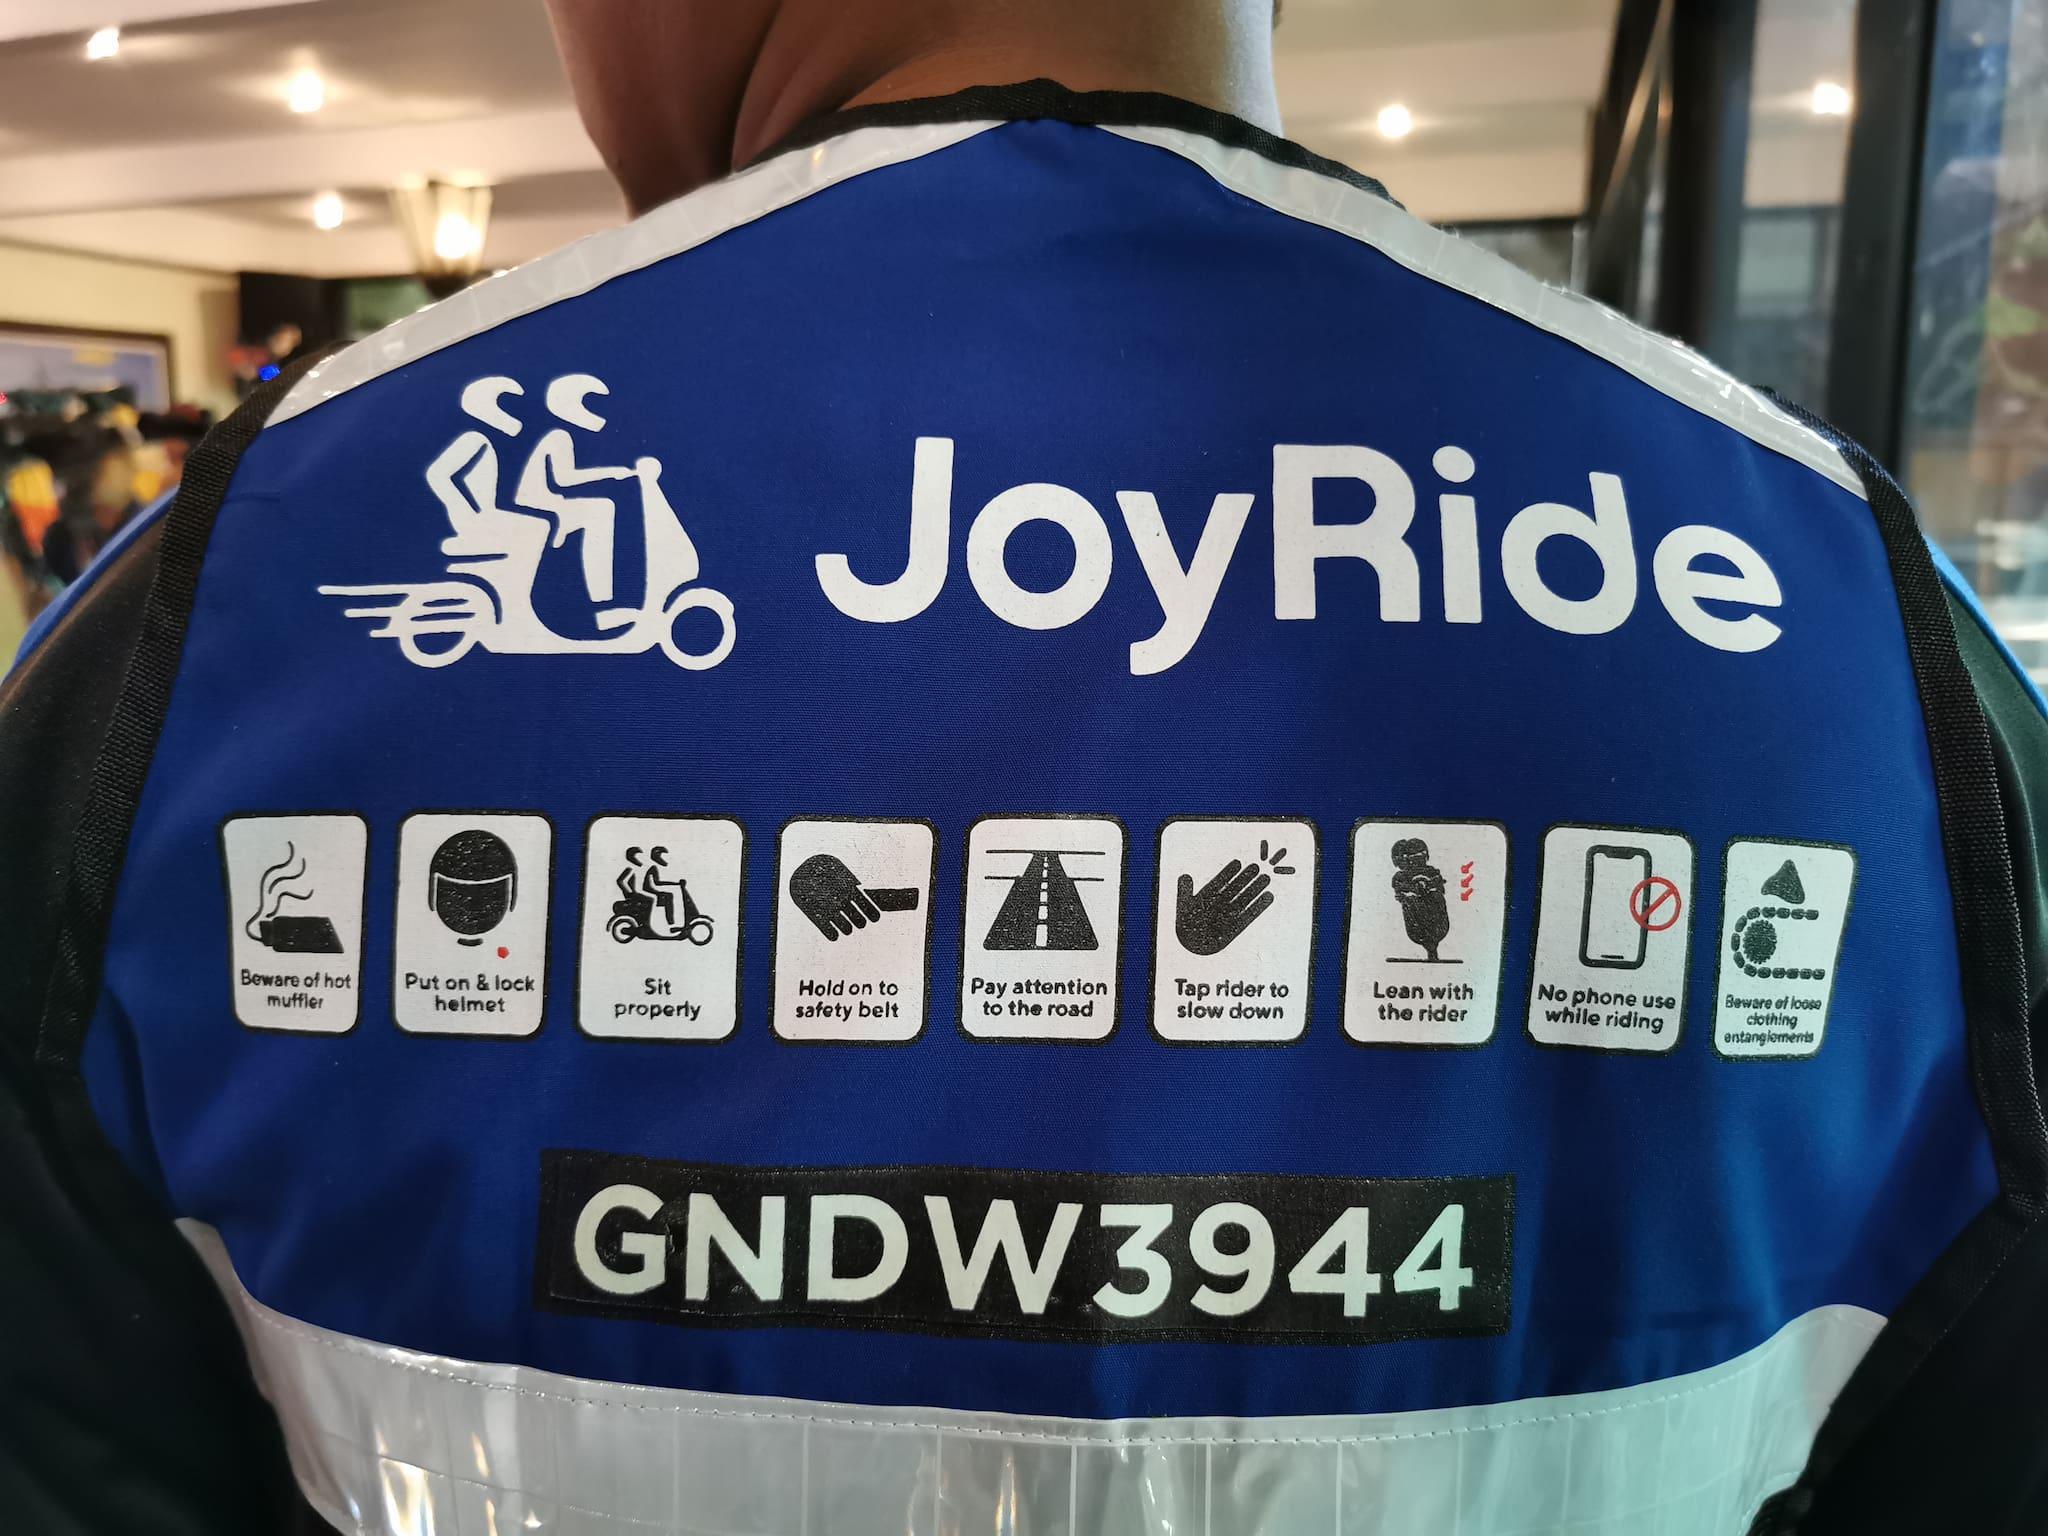 Joyride Tops PH\'s Ride-Hailing Mobile Apps in Apple Store